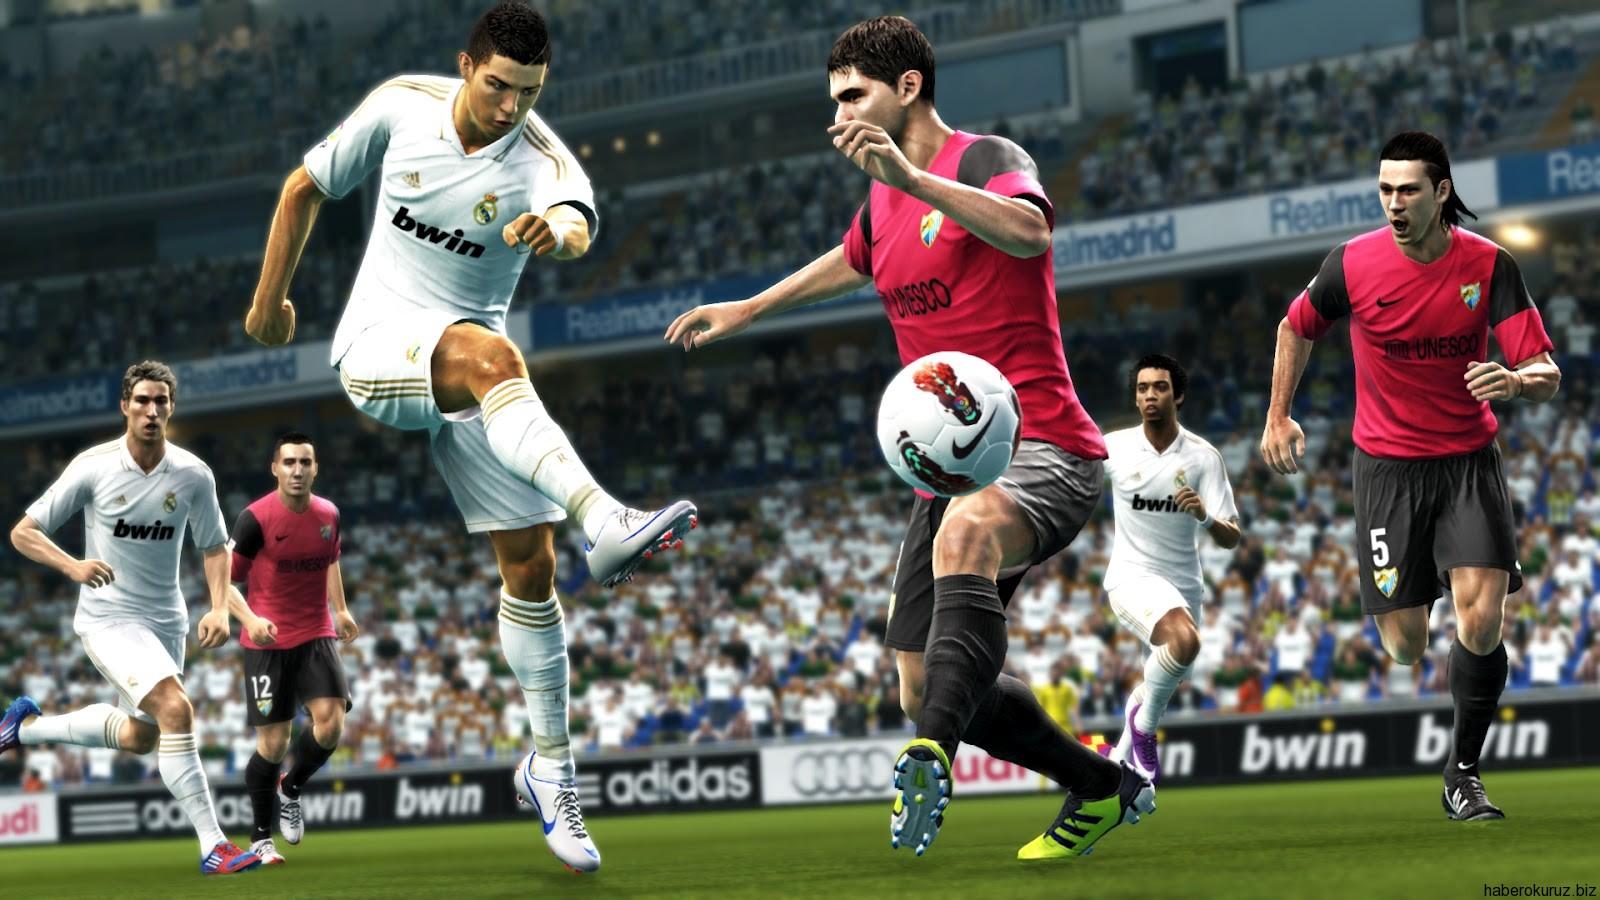 Pro Evolution Soccer 2013 For Mac Os X